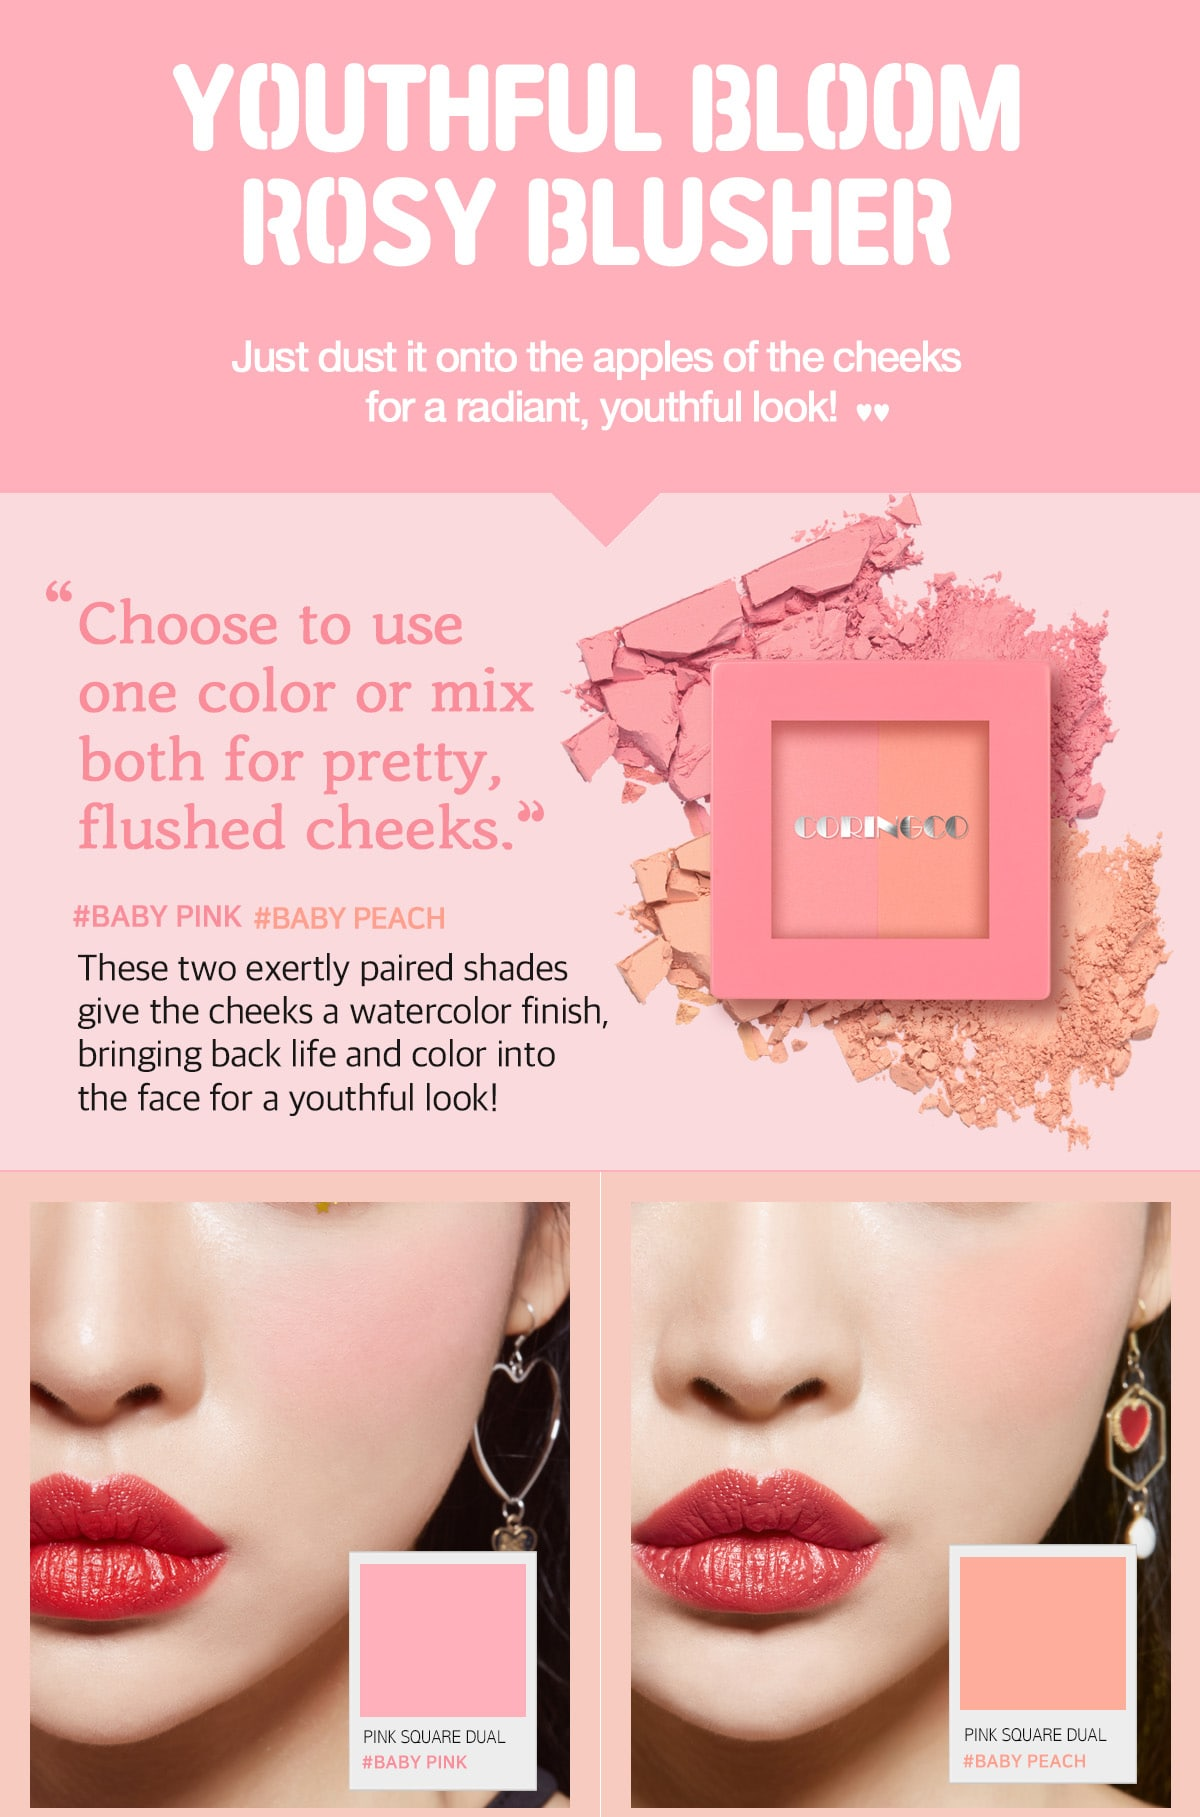 Pink Square Dual Cheek - Intro